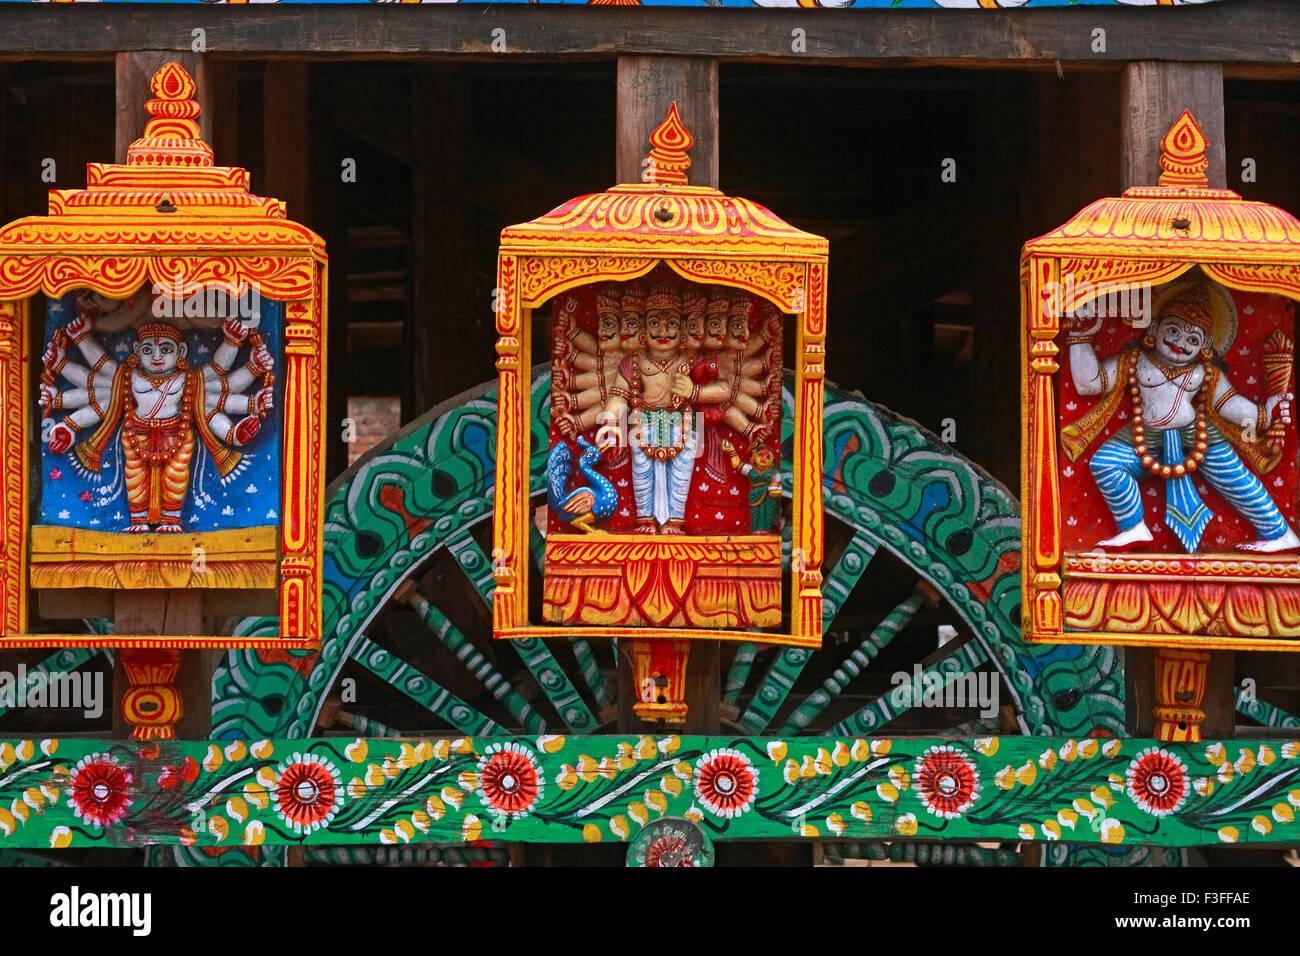 Gods statues on Rath yatra or Cart festival of Jagannath ; Puri ; Orissa ; India - Stock Image